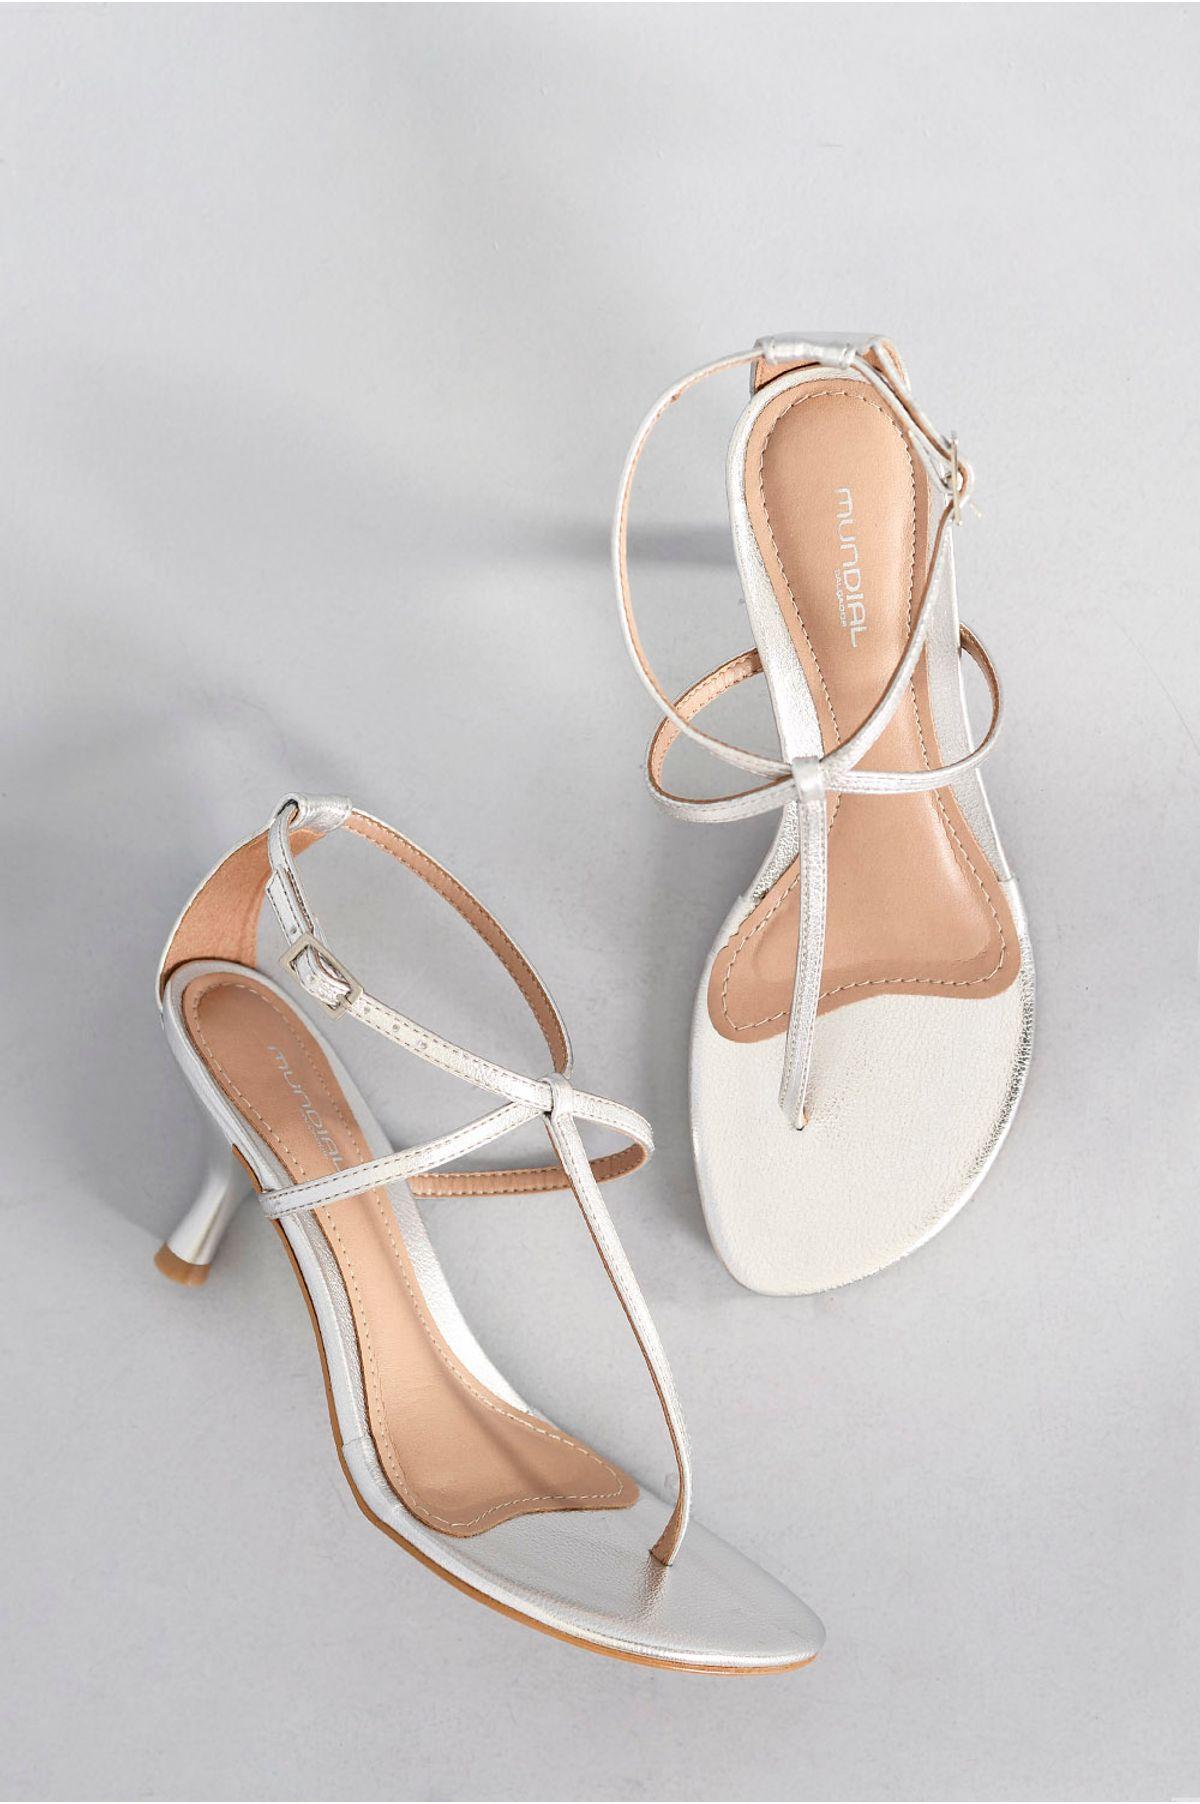 4a1b0b0e66 Sandália Feminina Salto Médio Marilyn Mundial PRATA - Mundial Calçados